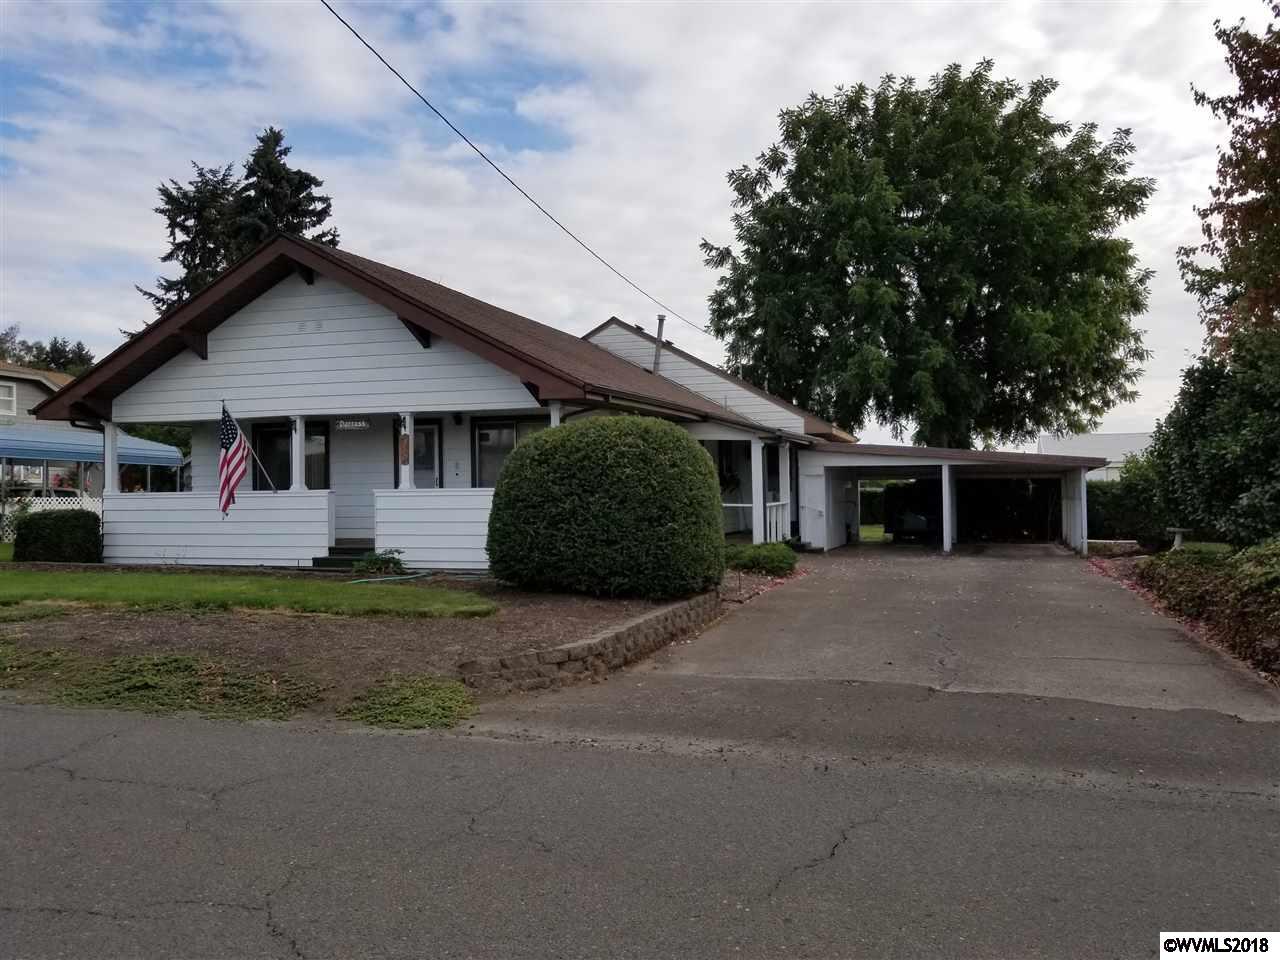 3480 Blossom Dr NE, Salem, Oregon